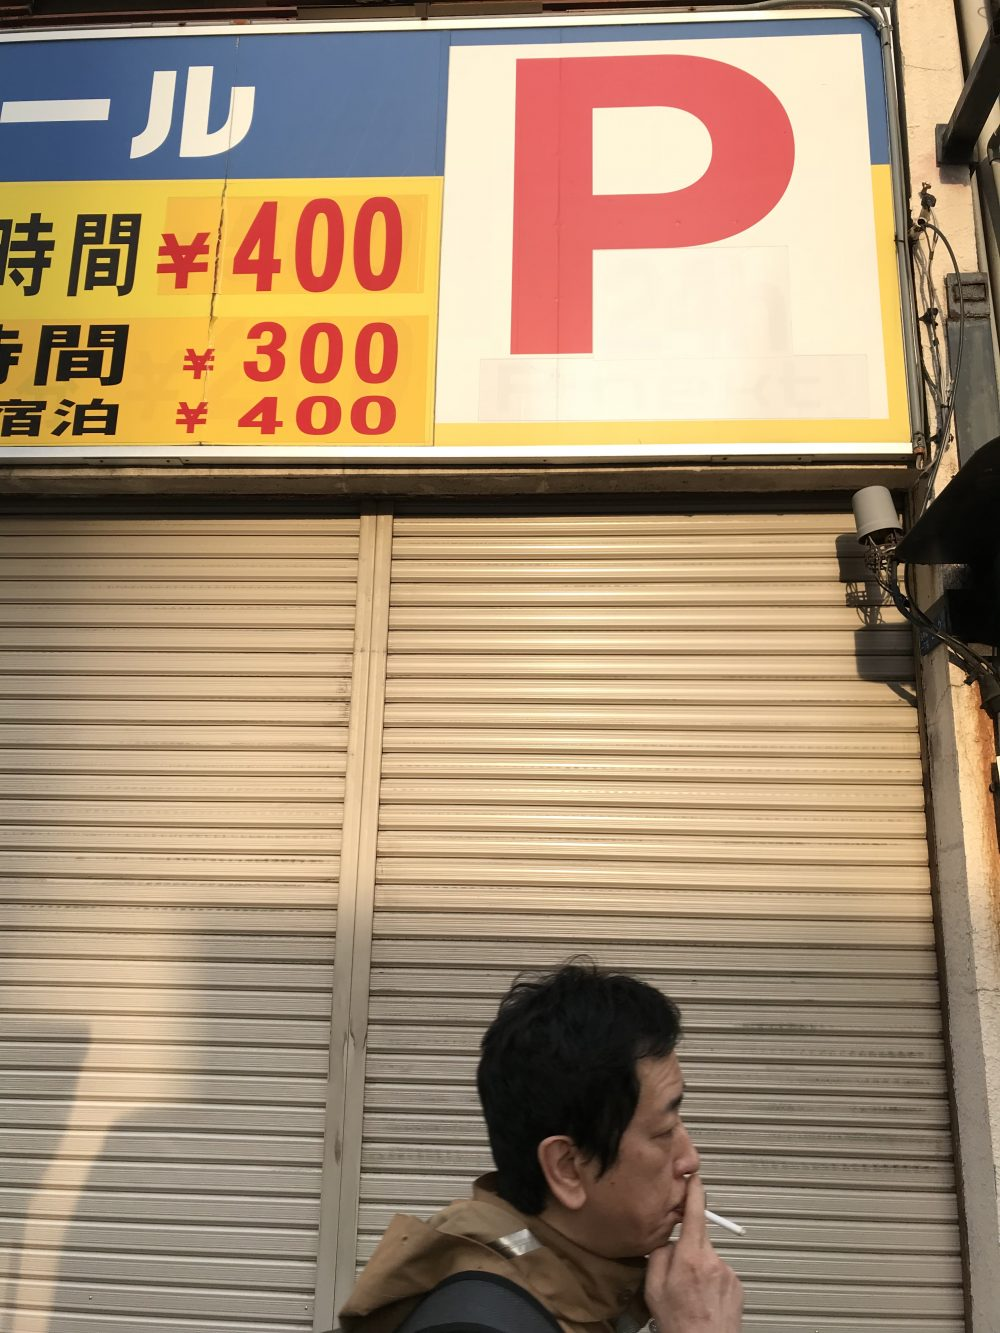 iPad Pro street photograph, Osaka 2018